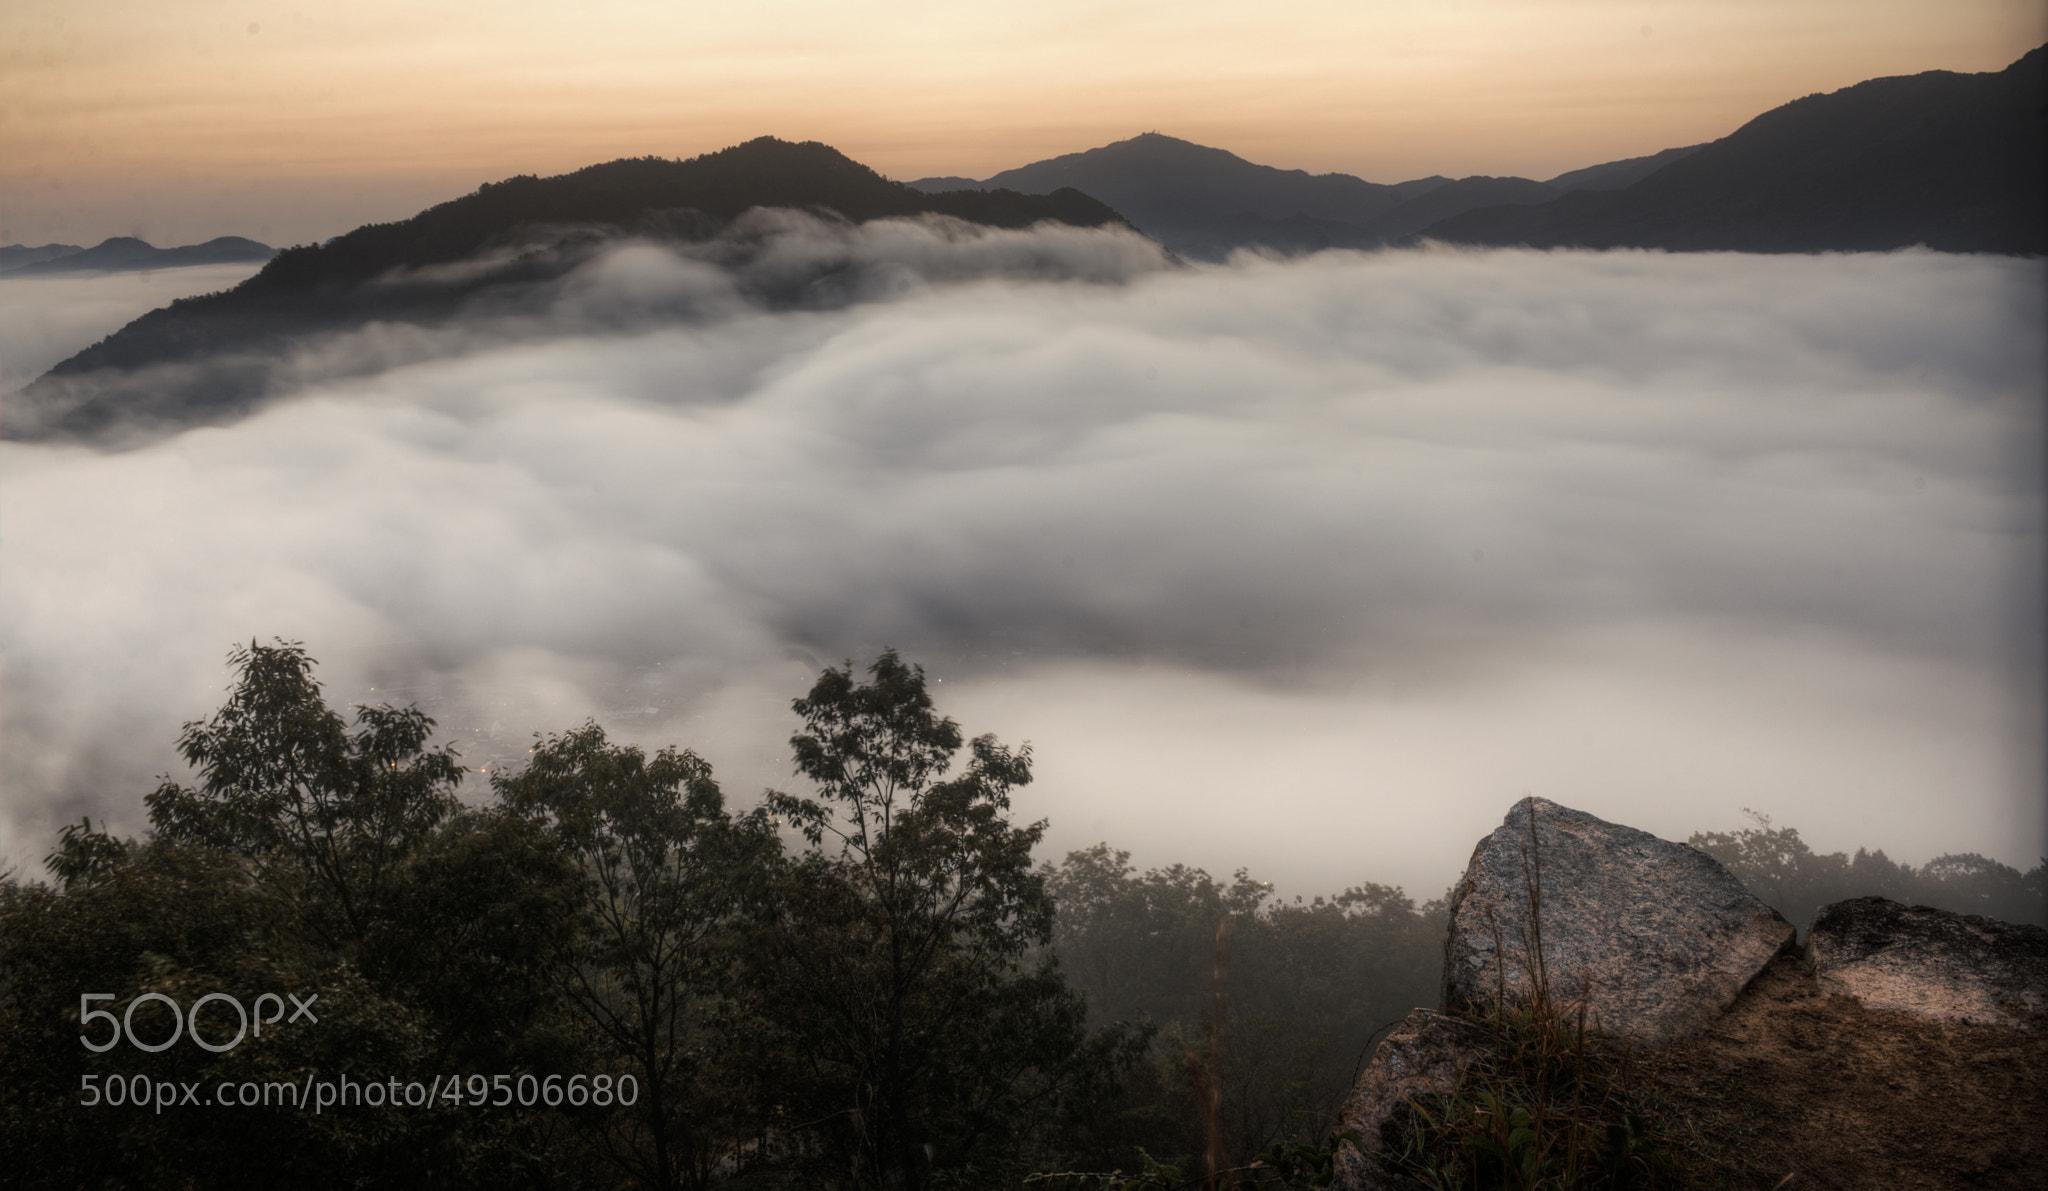 Photograph Mountain View by hugh dornan on 500px